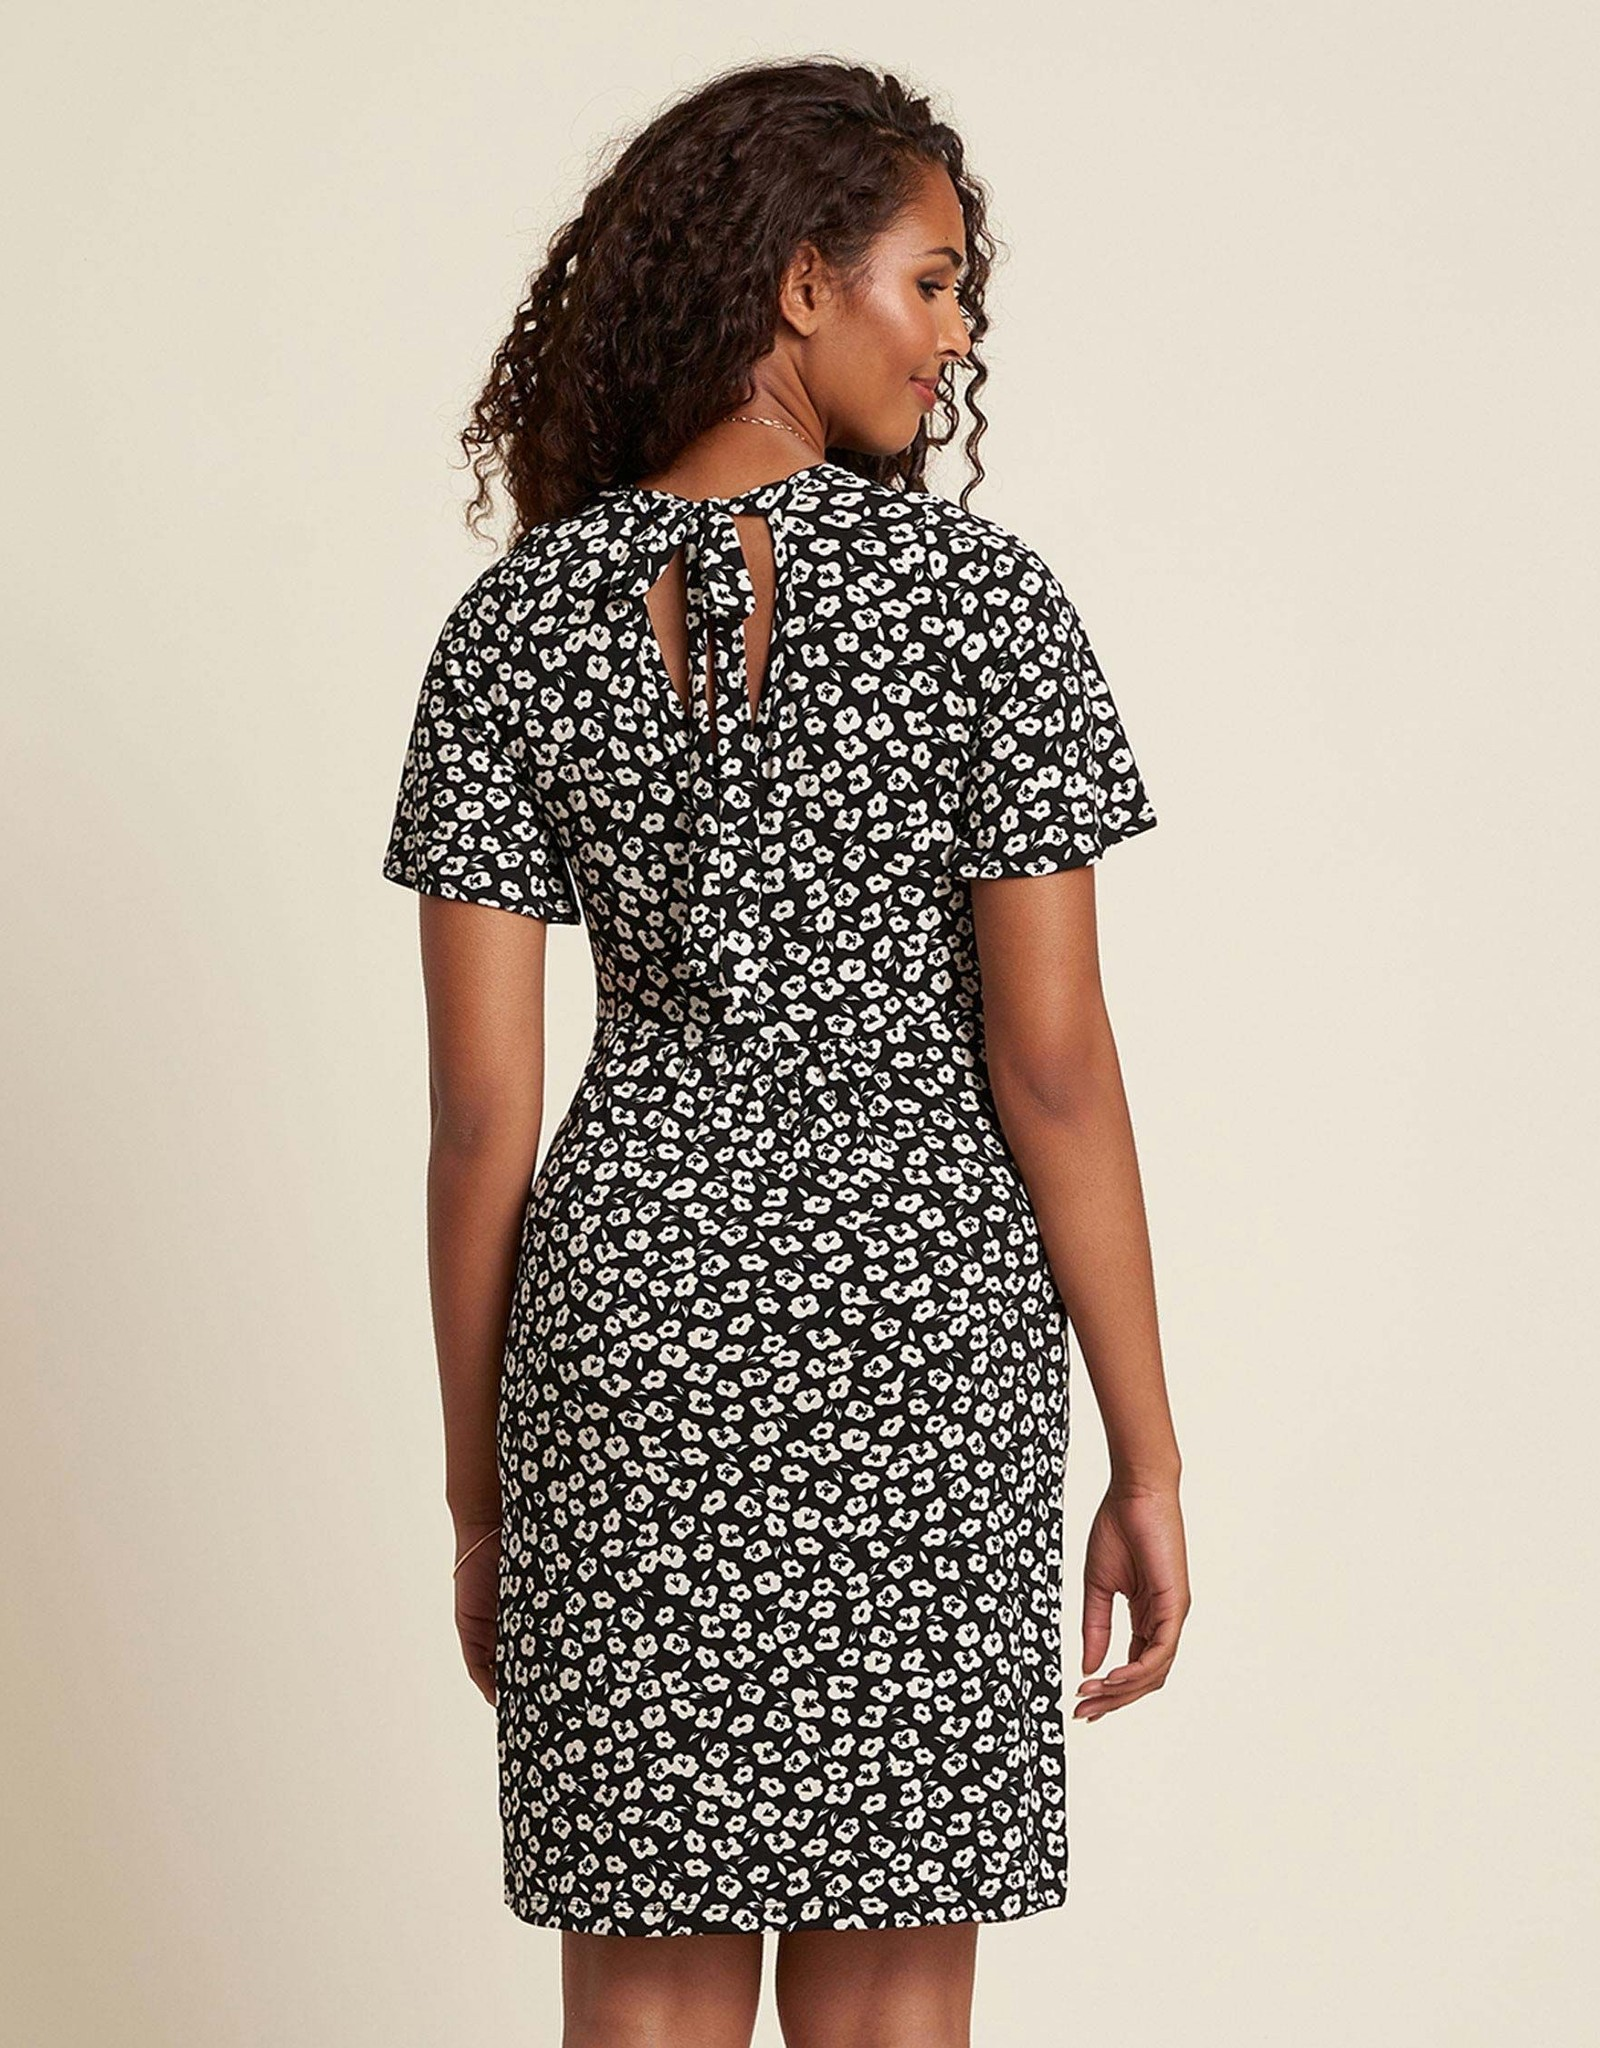 Hatley Maggie Dress